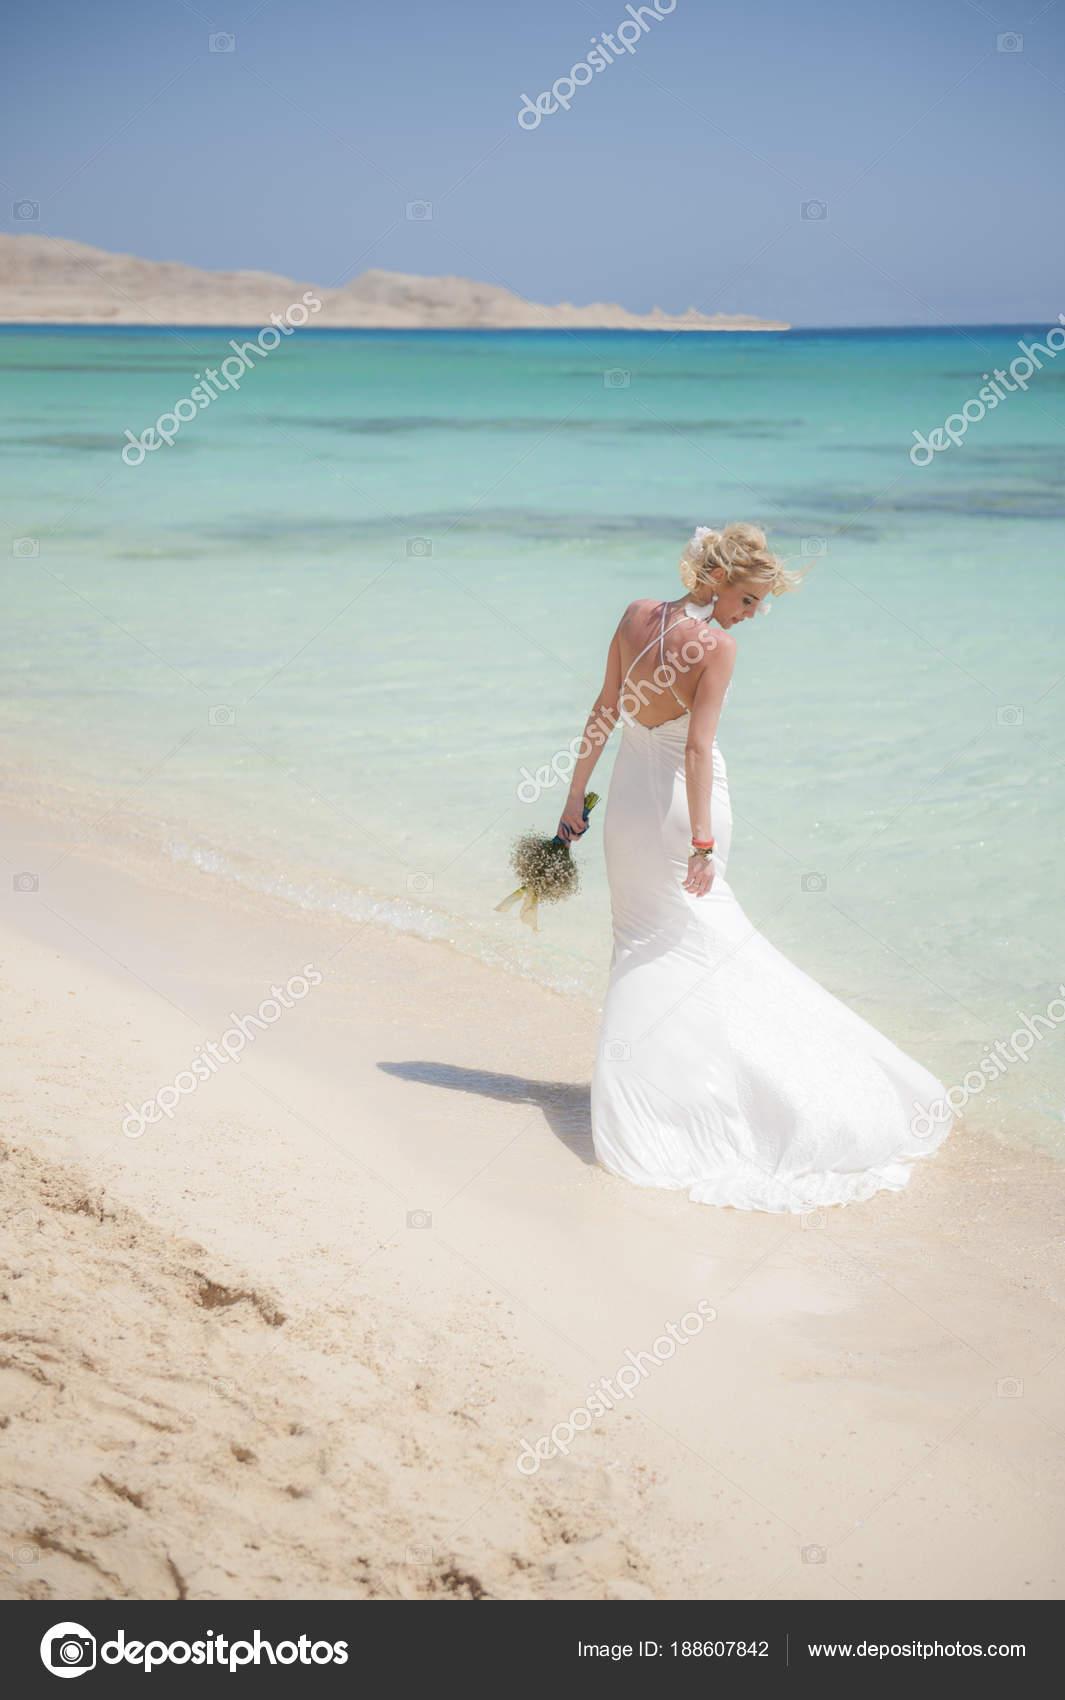 Beautiful Bride On A Tropical Beach Wedding Day Stock Photo